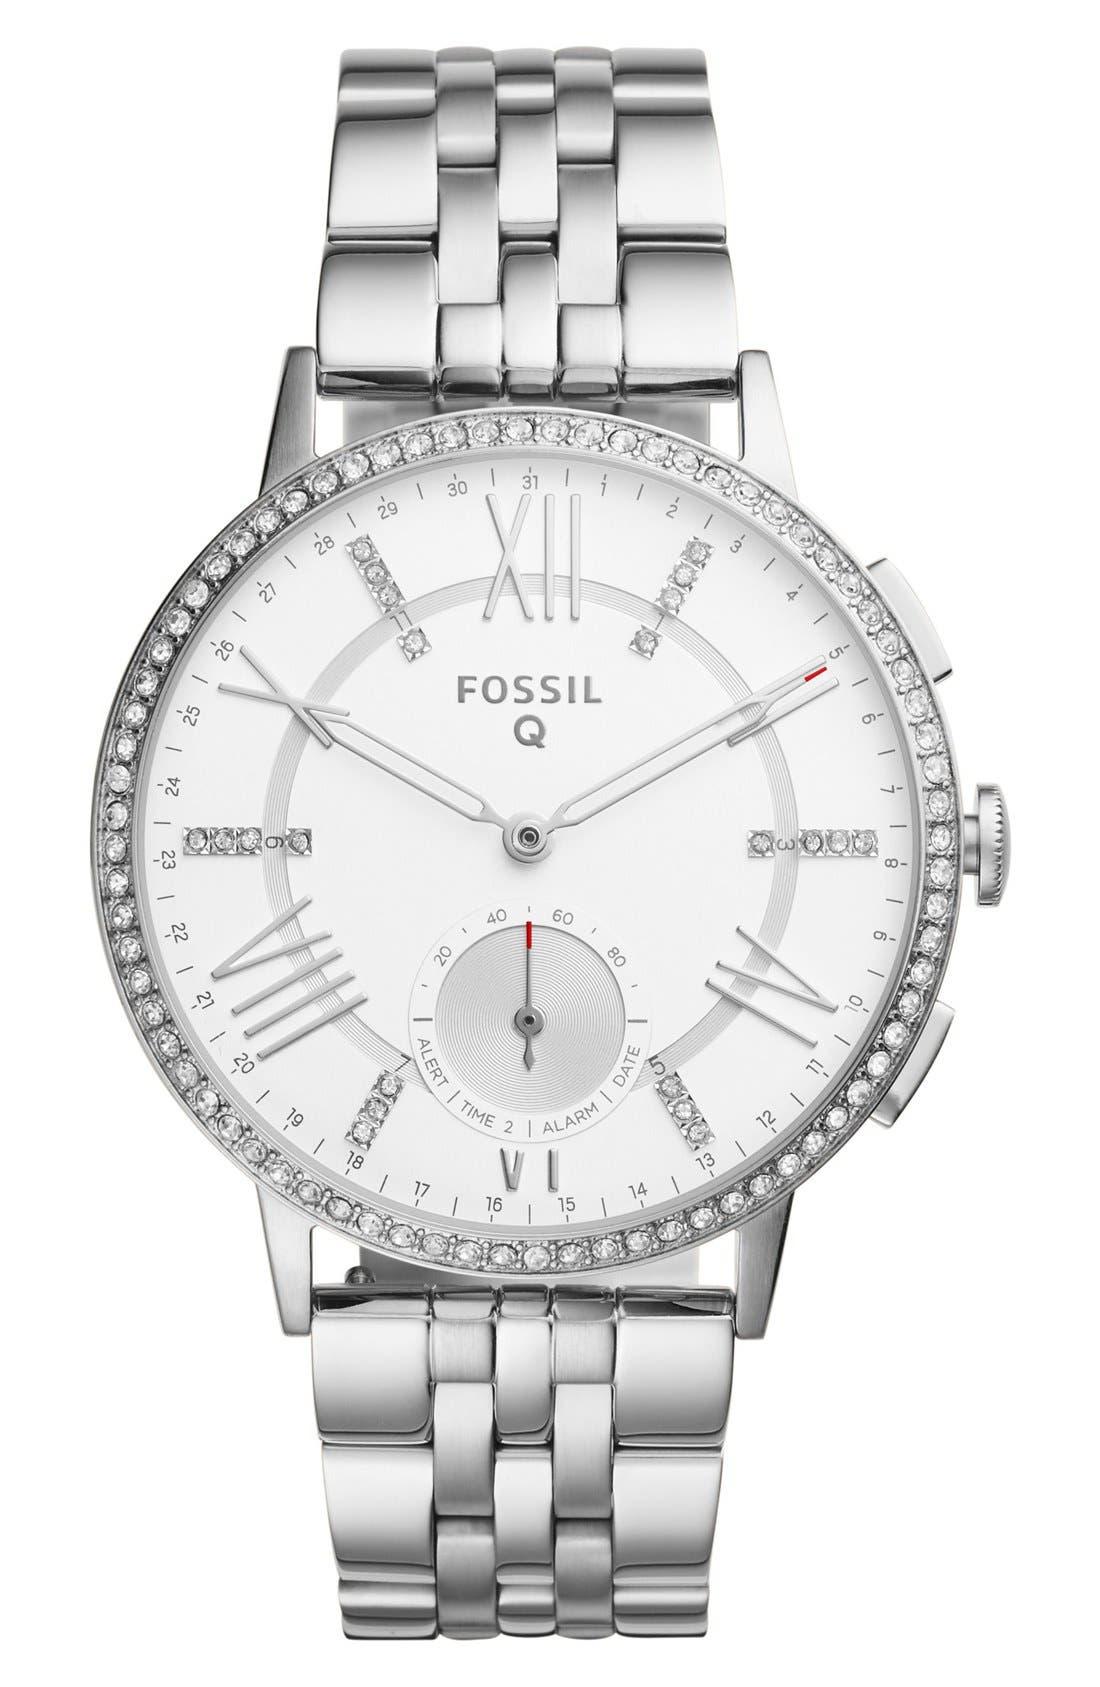 Fossil Q Gazer Hybrid Smart Bracelet Watch, 41mm